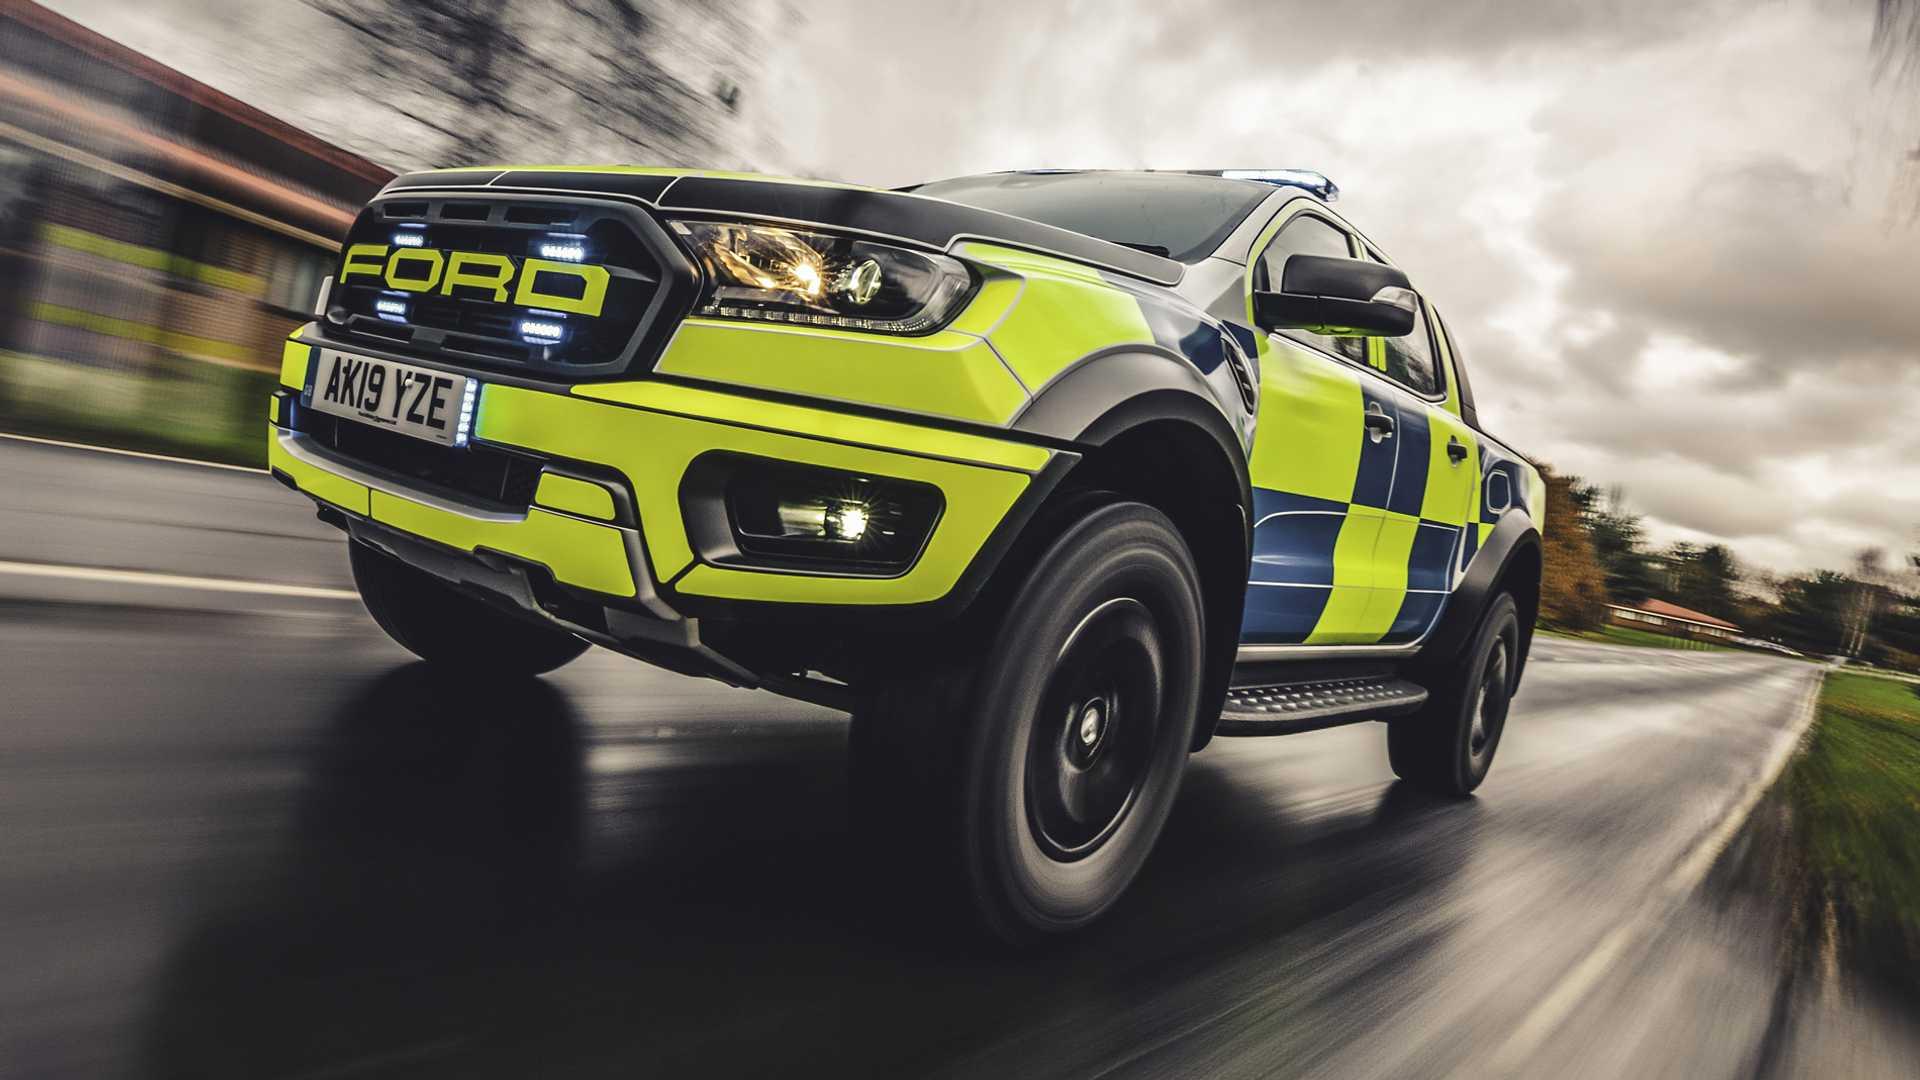 Ford-Focus-ST-and-Ranger-Raptor-UK-police-cars-12